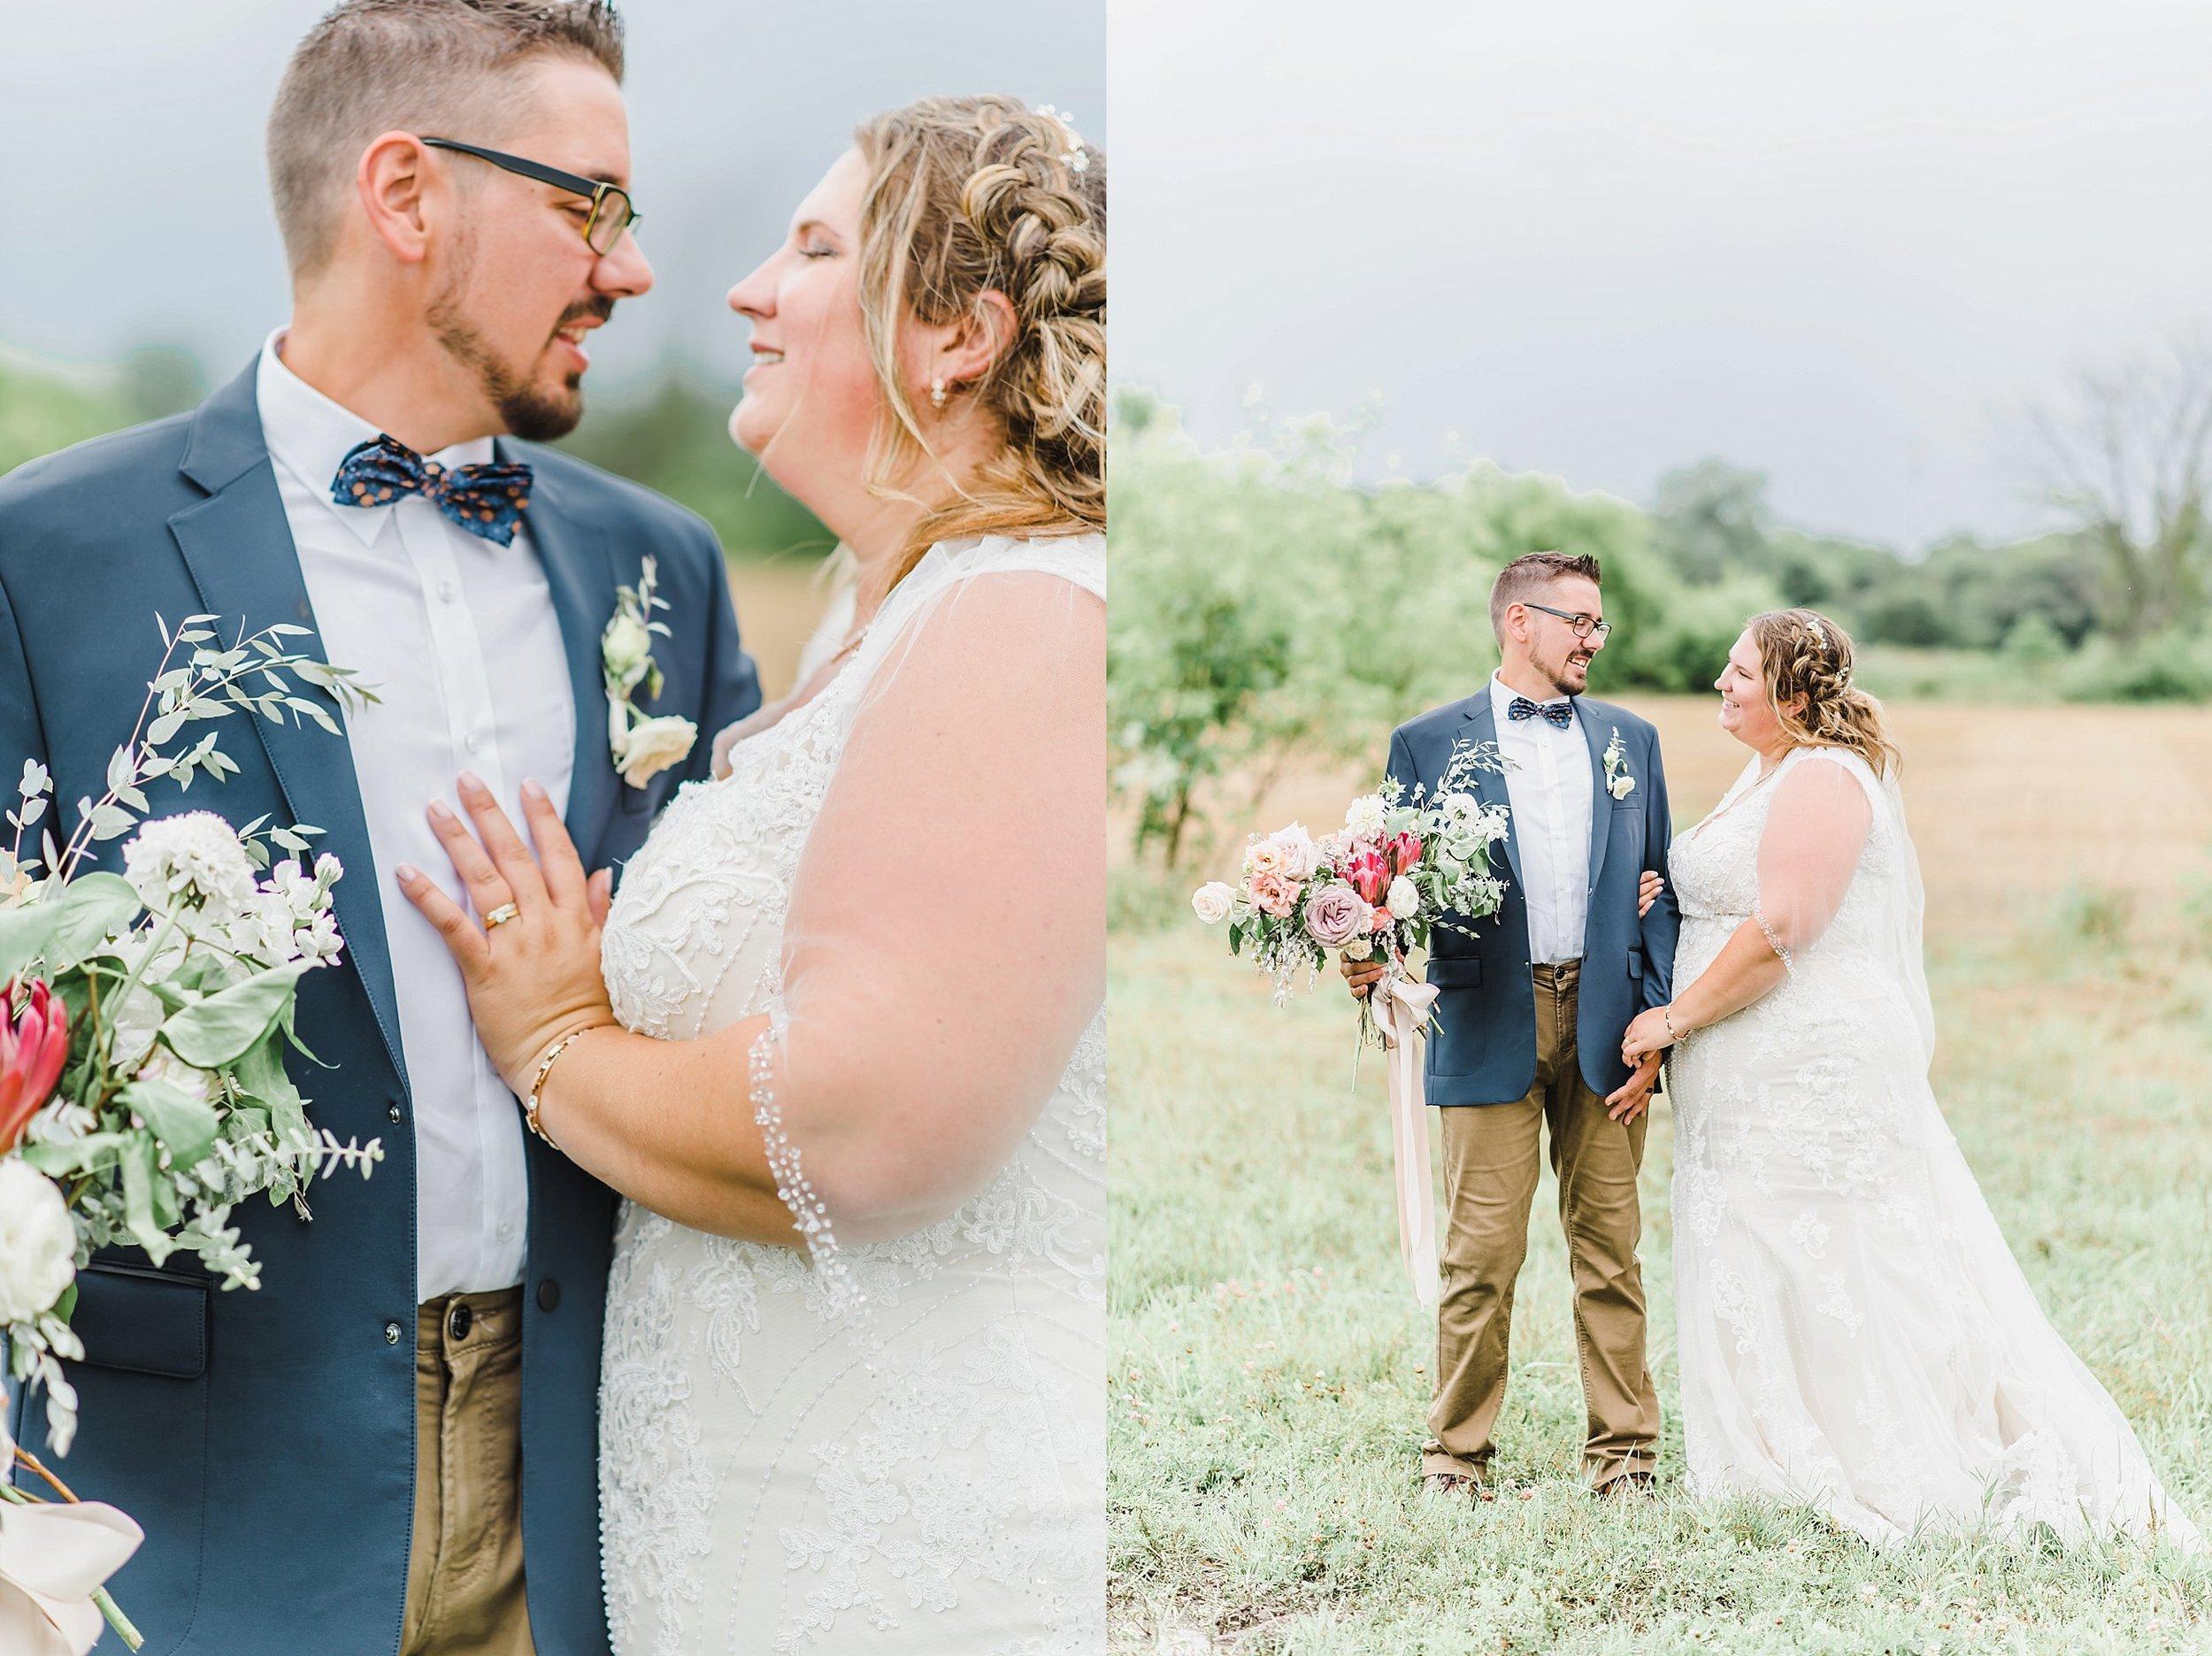 light airy indie fine art ottawa wedding photographer | Ali and Batoul Photography_0404.jpg